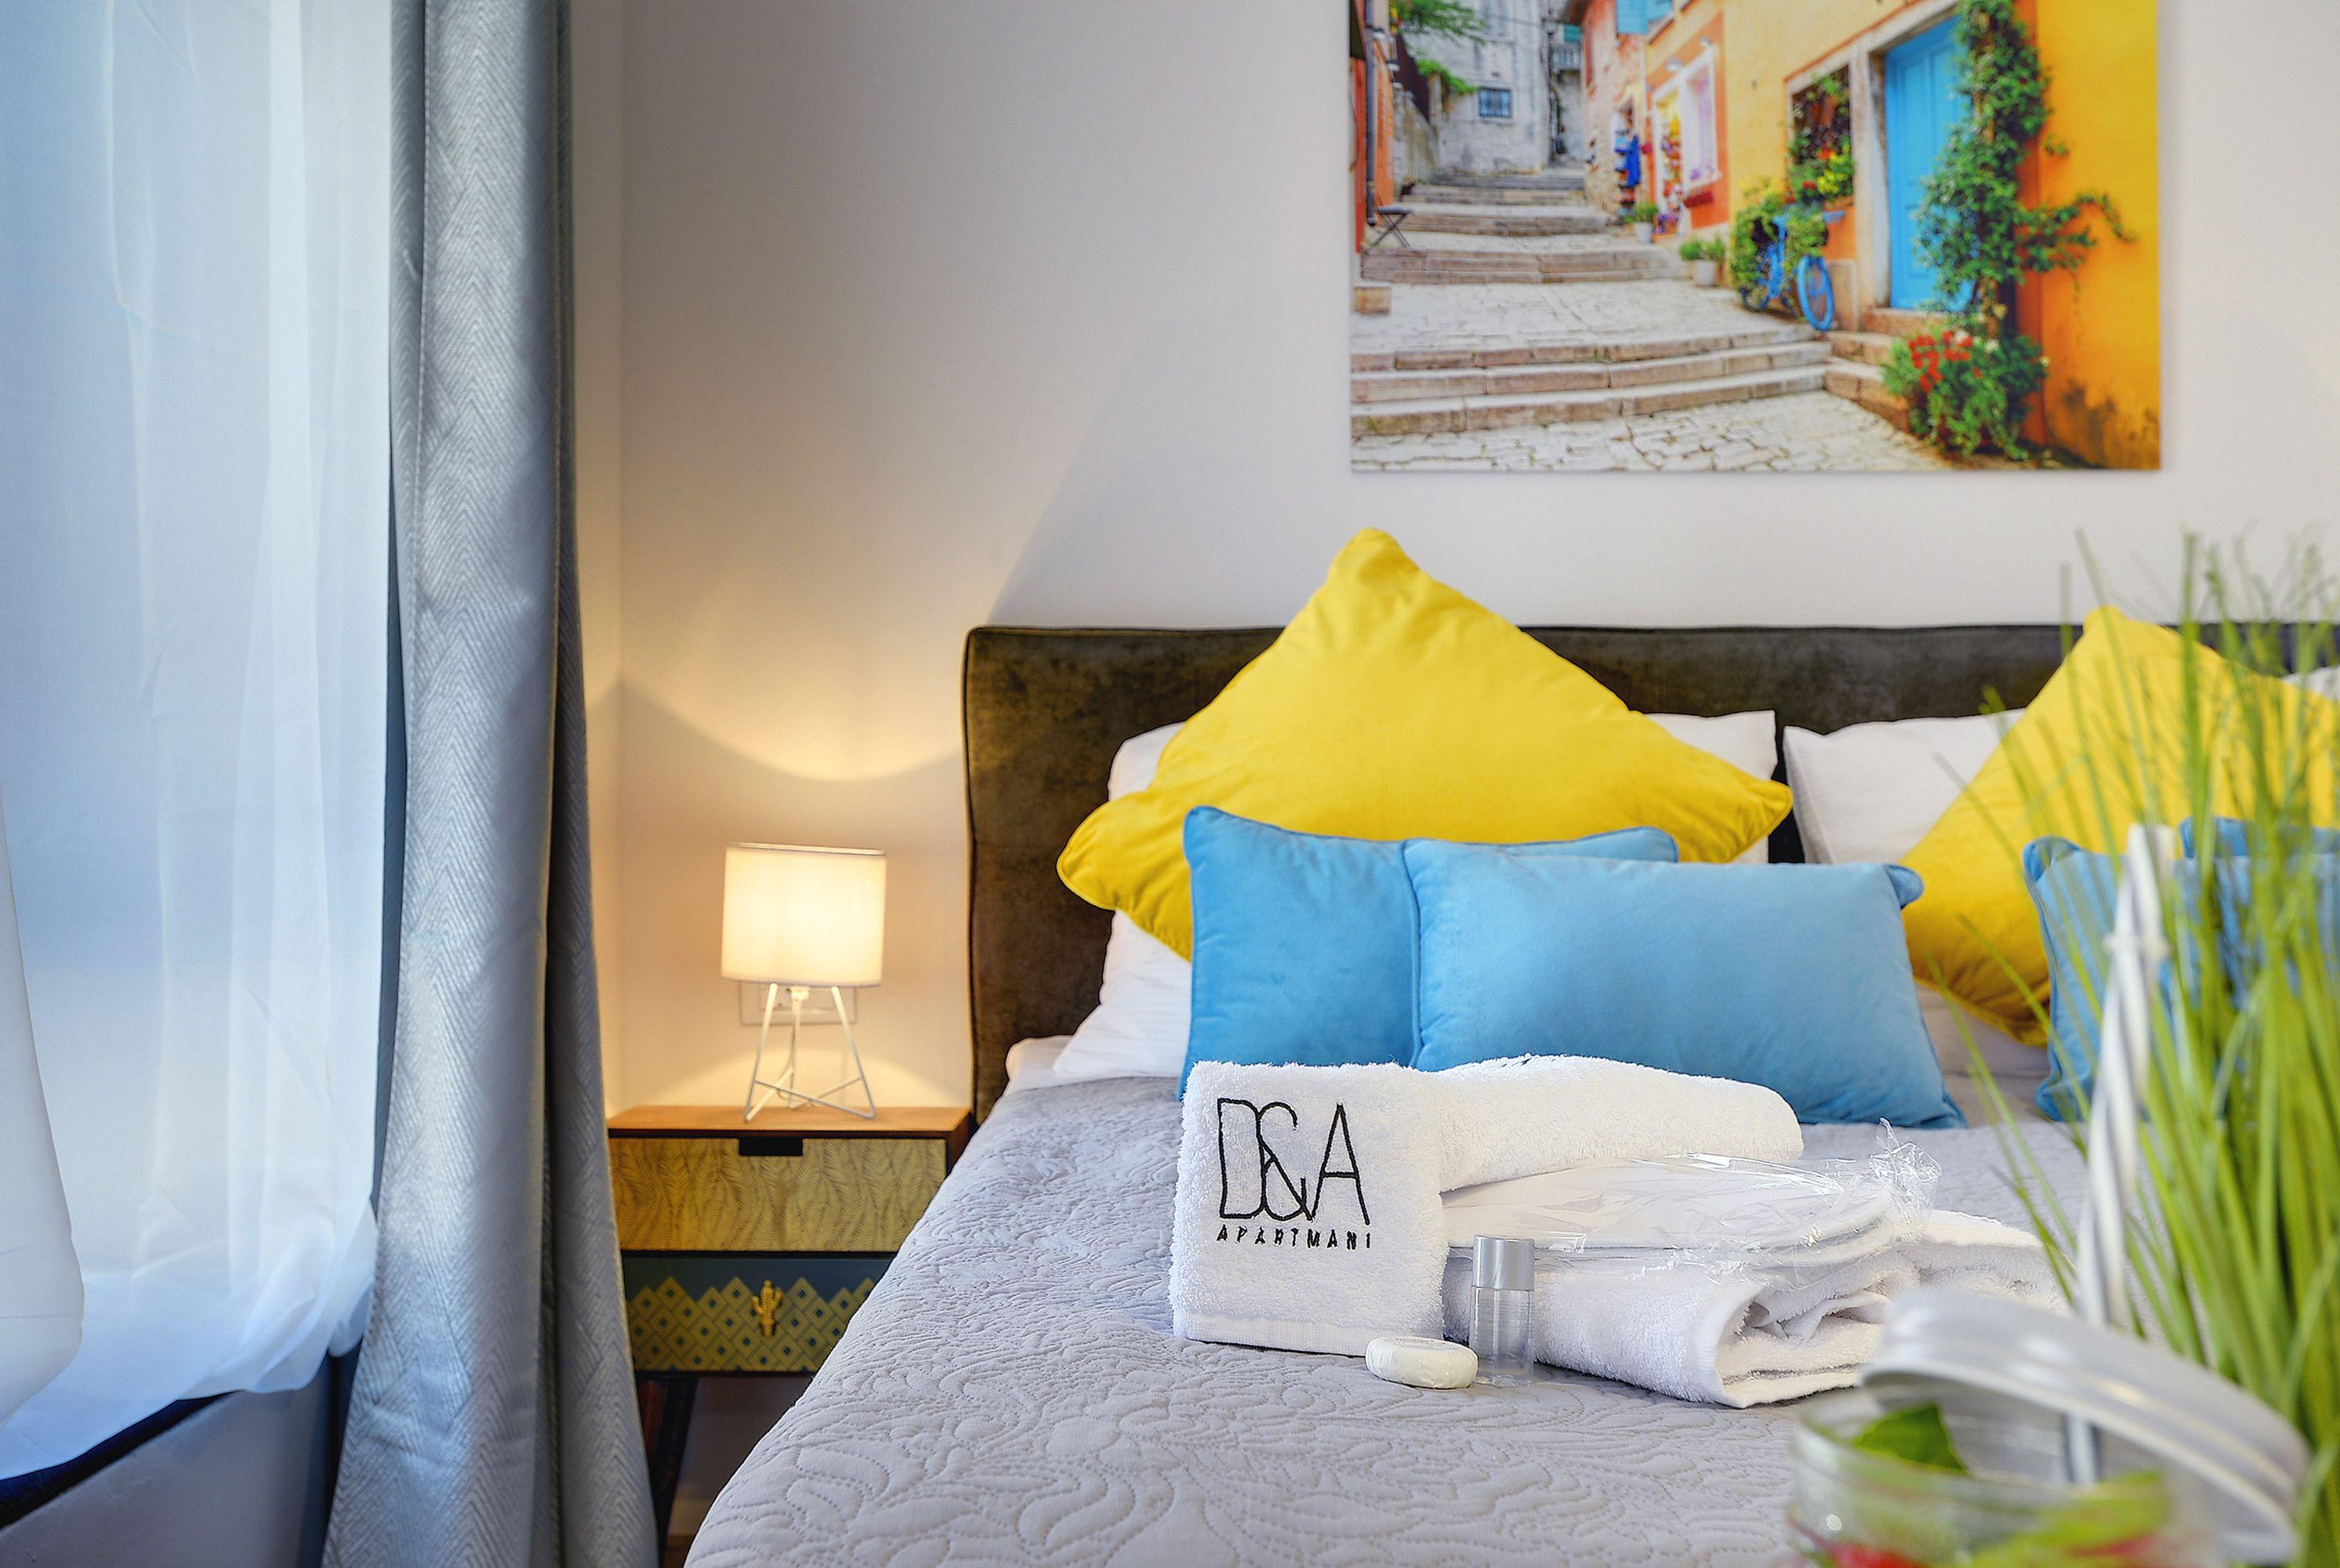 Danda Amphitheatre Apartments